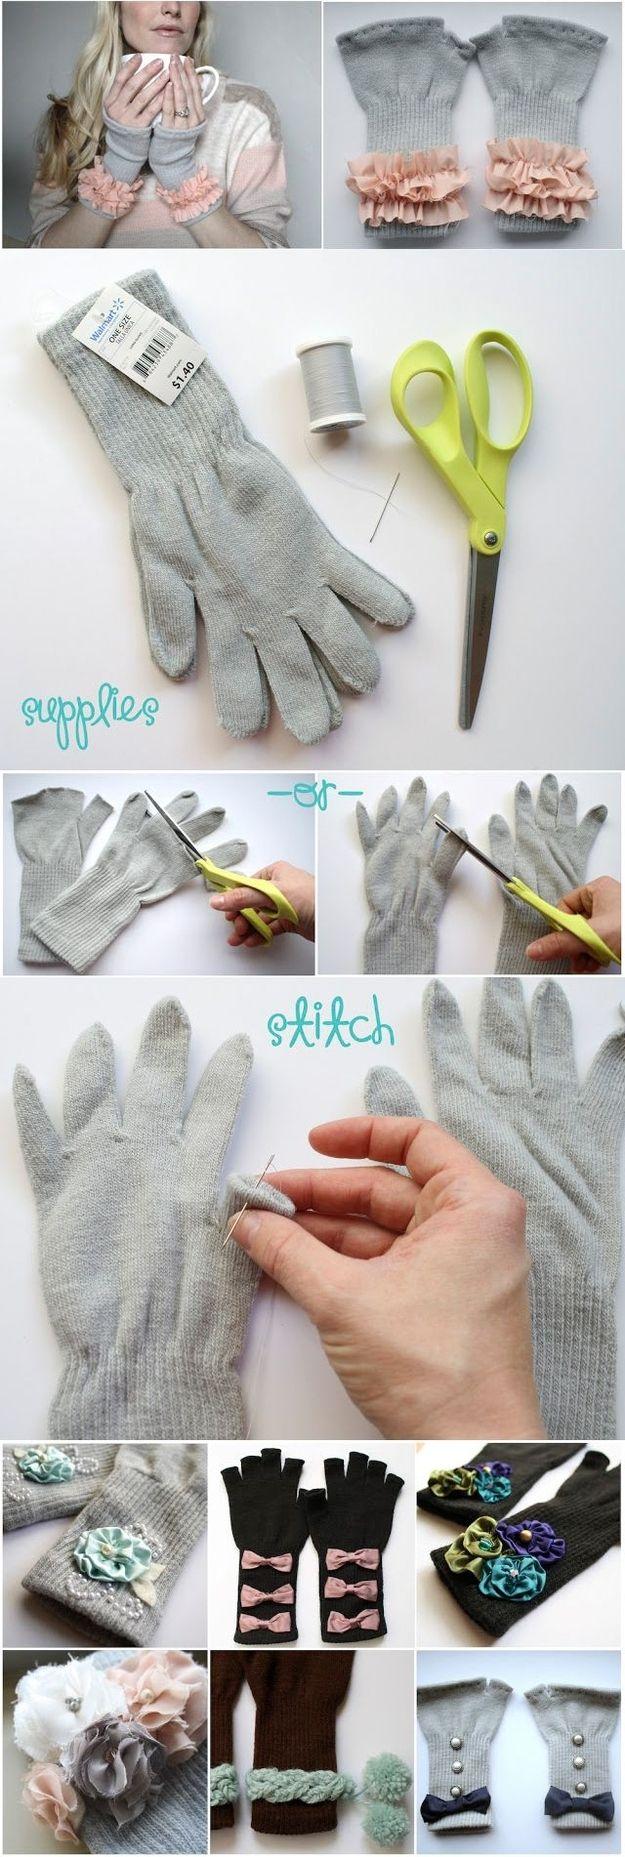 diy-gloves-002